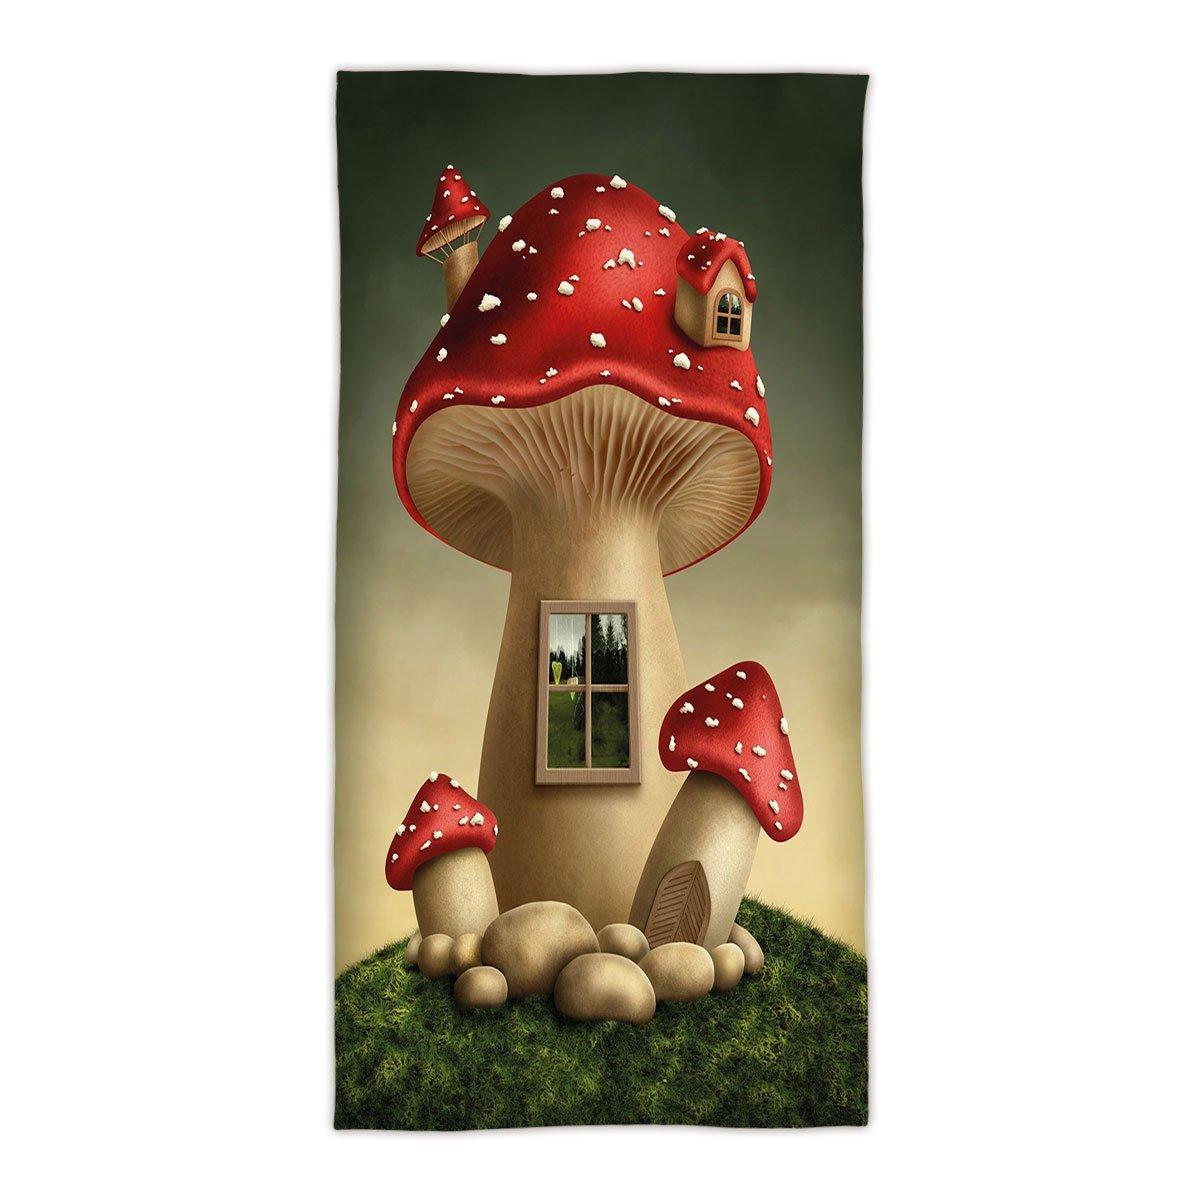 31.49''W x 62.99''L Cotton Microfiber Bath/Hand Towel,Mushroom,Alone Fantasy Mushroom House in Fantasy Forest Cottage Window Surreal Decorative,Light Brown Green Red,Ultra Soft,For Hotel Spa Beach Pool